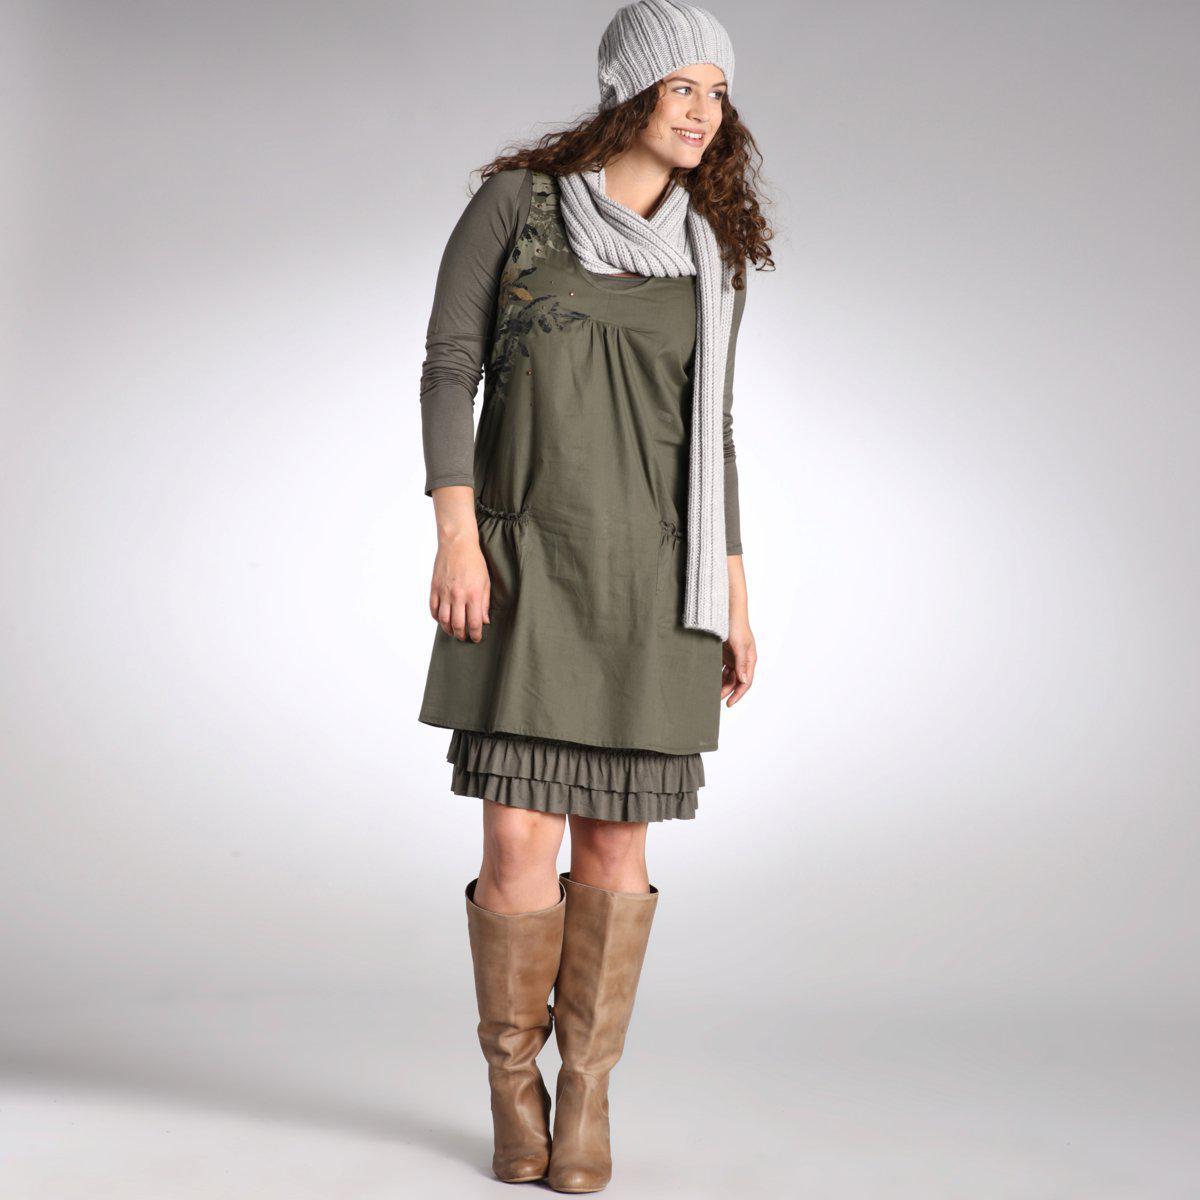 bradyna foremata 214 - Βραδυνα Φορεματα LaRedoute Φθινόπωρο 2011 Κωδ. 324213585